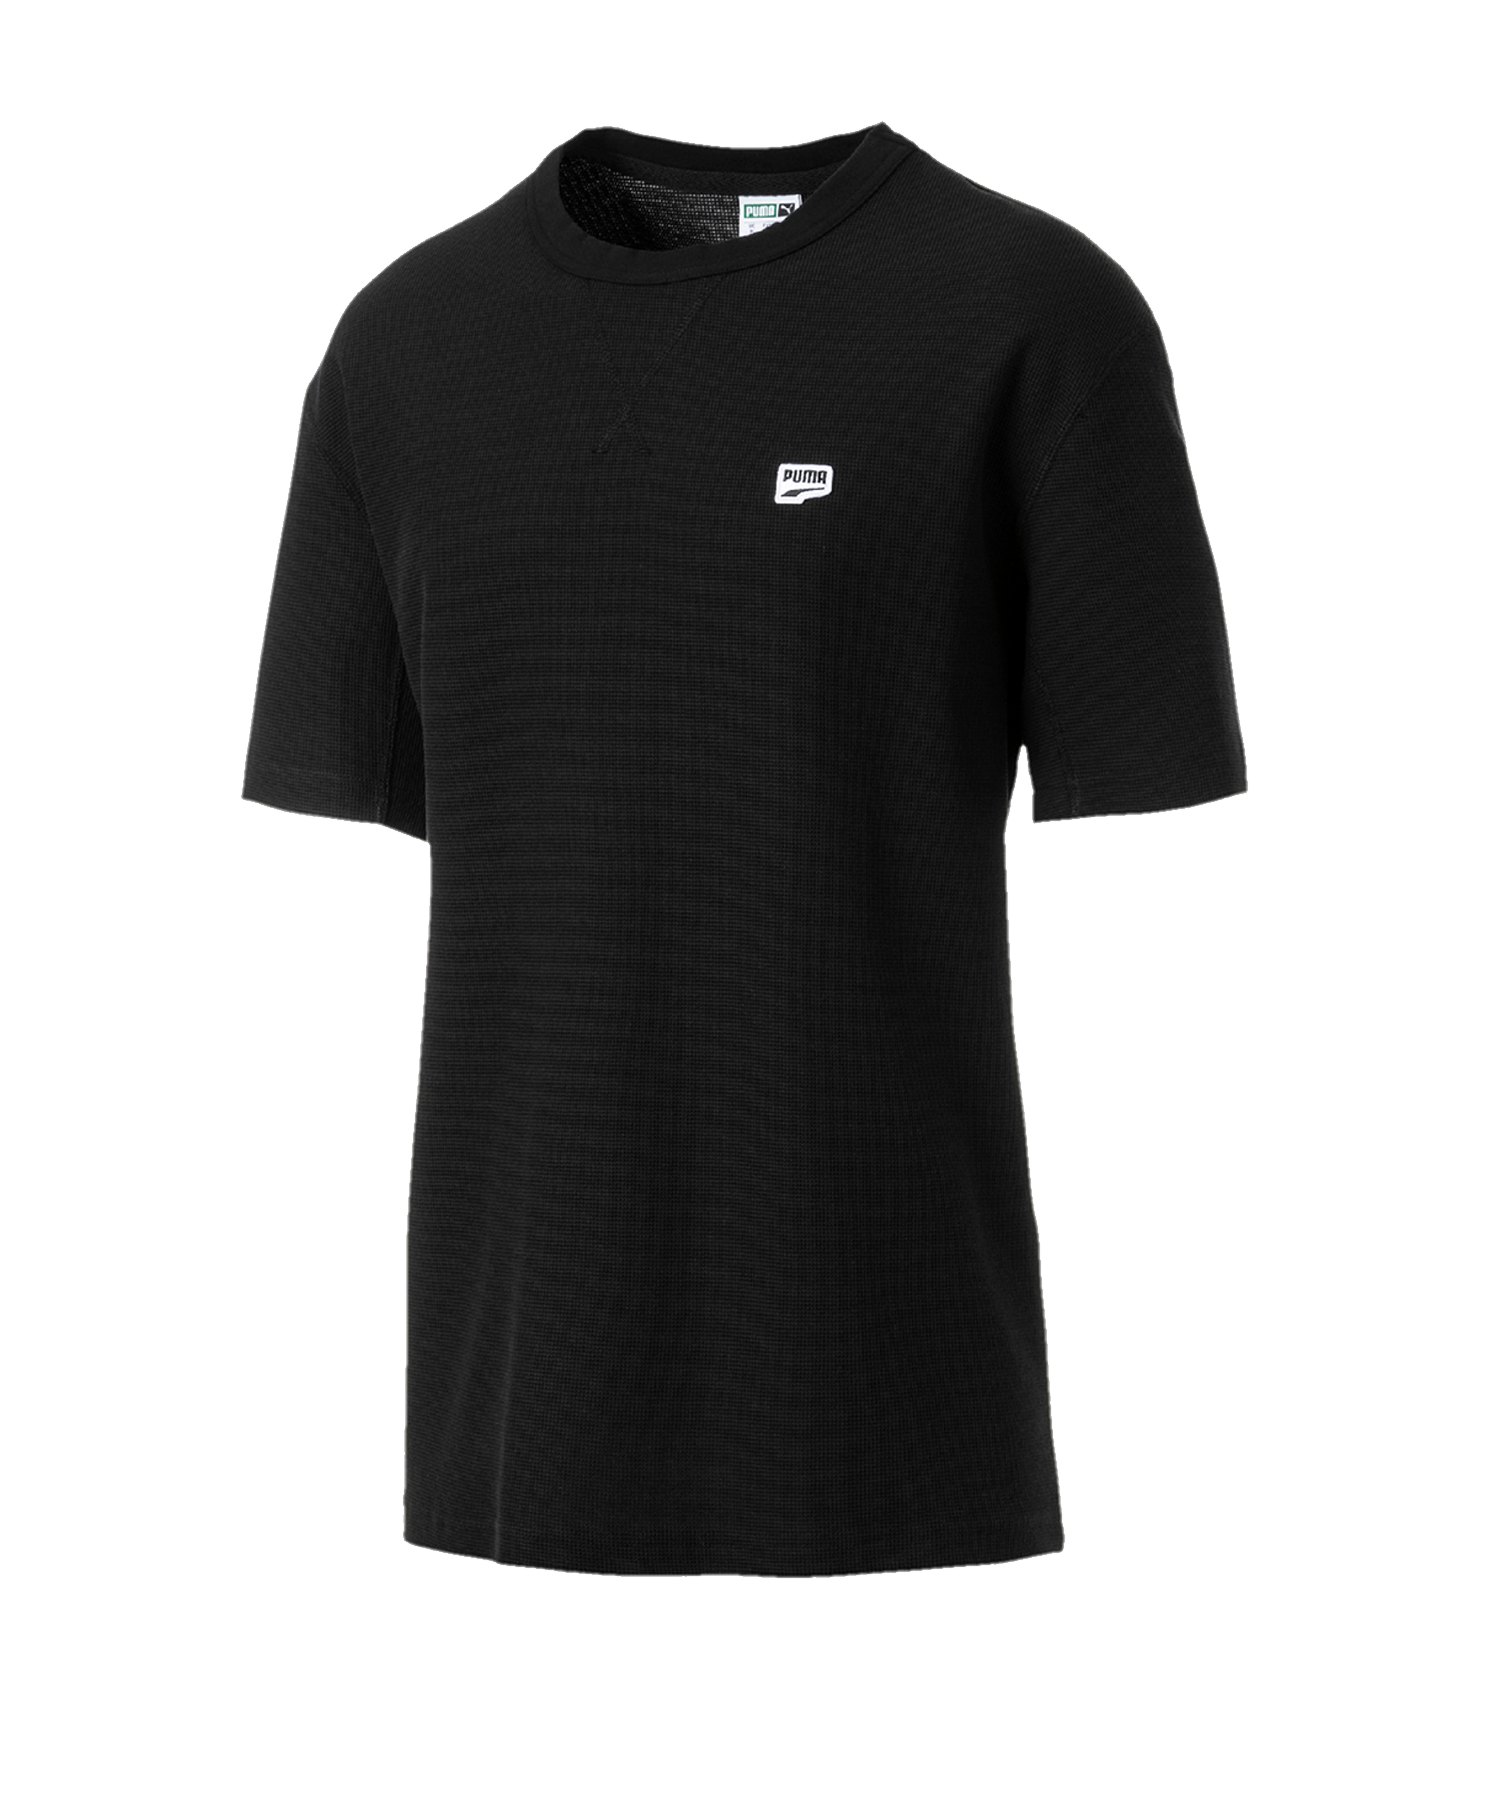 PUMA Downtown Tee T-Shirt Schwarz F01 - schwarz